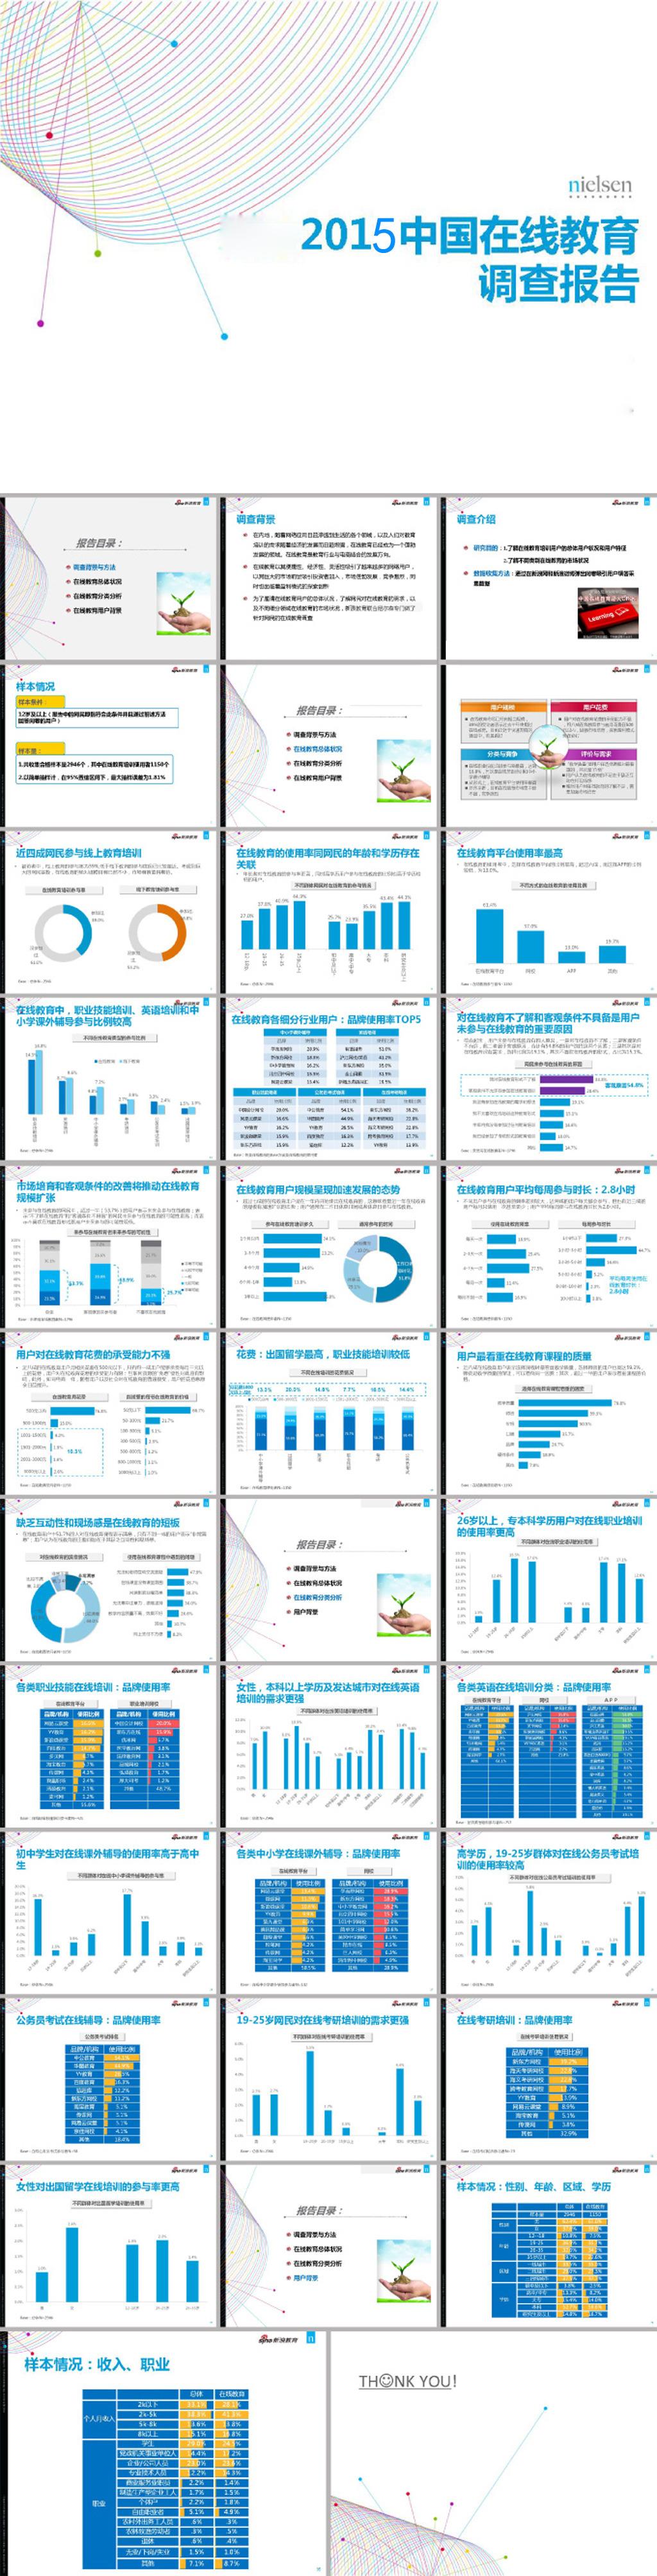 ppt模板 教育|培训|科研ppt > 2015中国教育在线调查报告模板  下一张